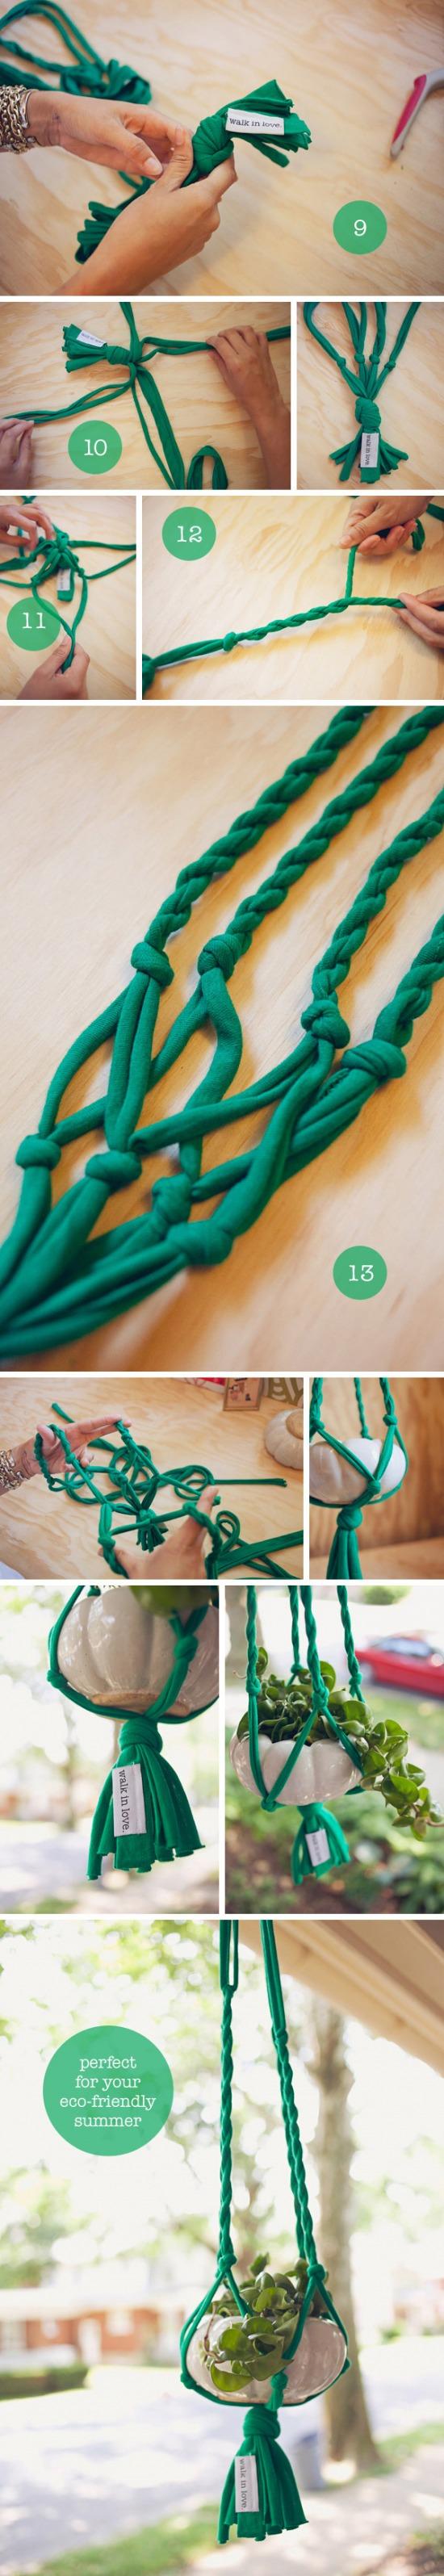 DIYteehanger-comp-2.jpg